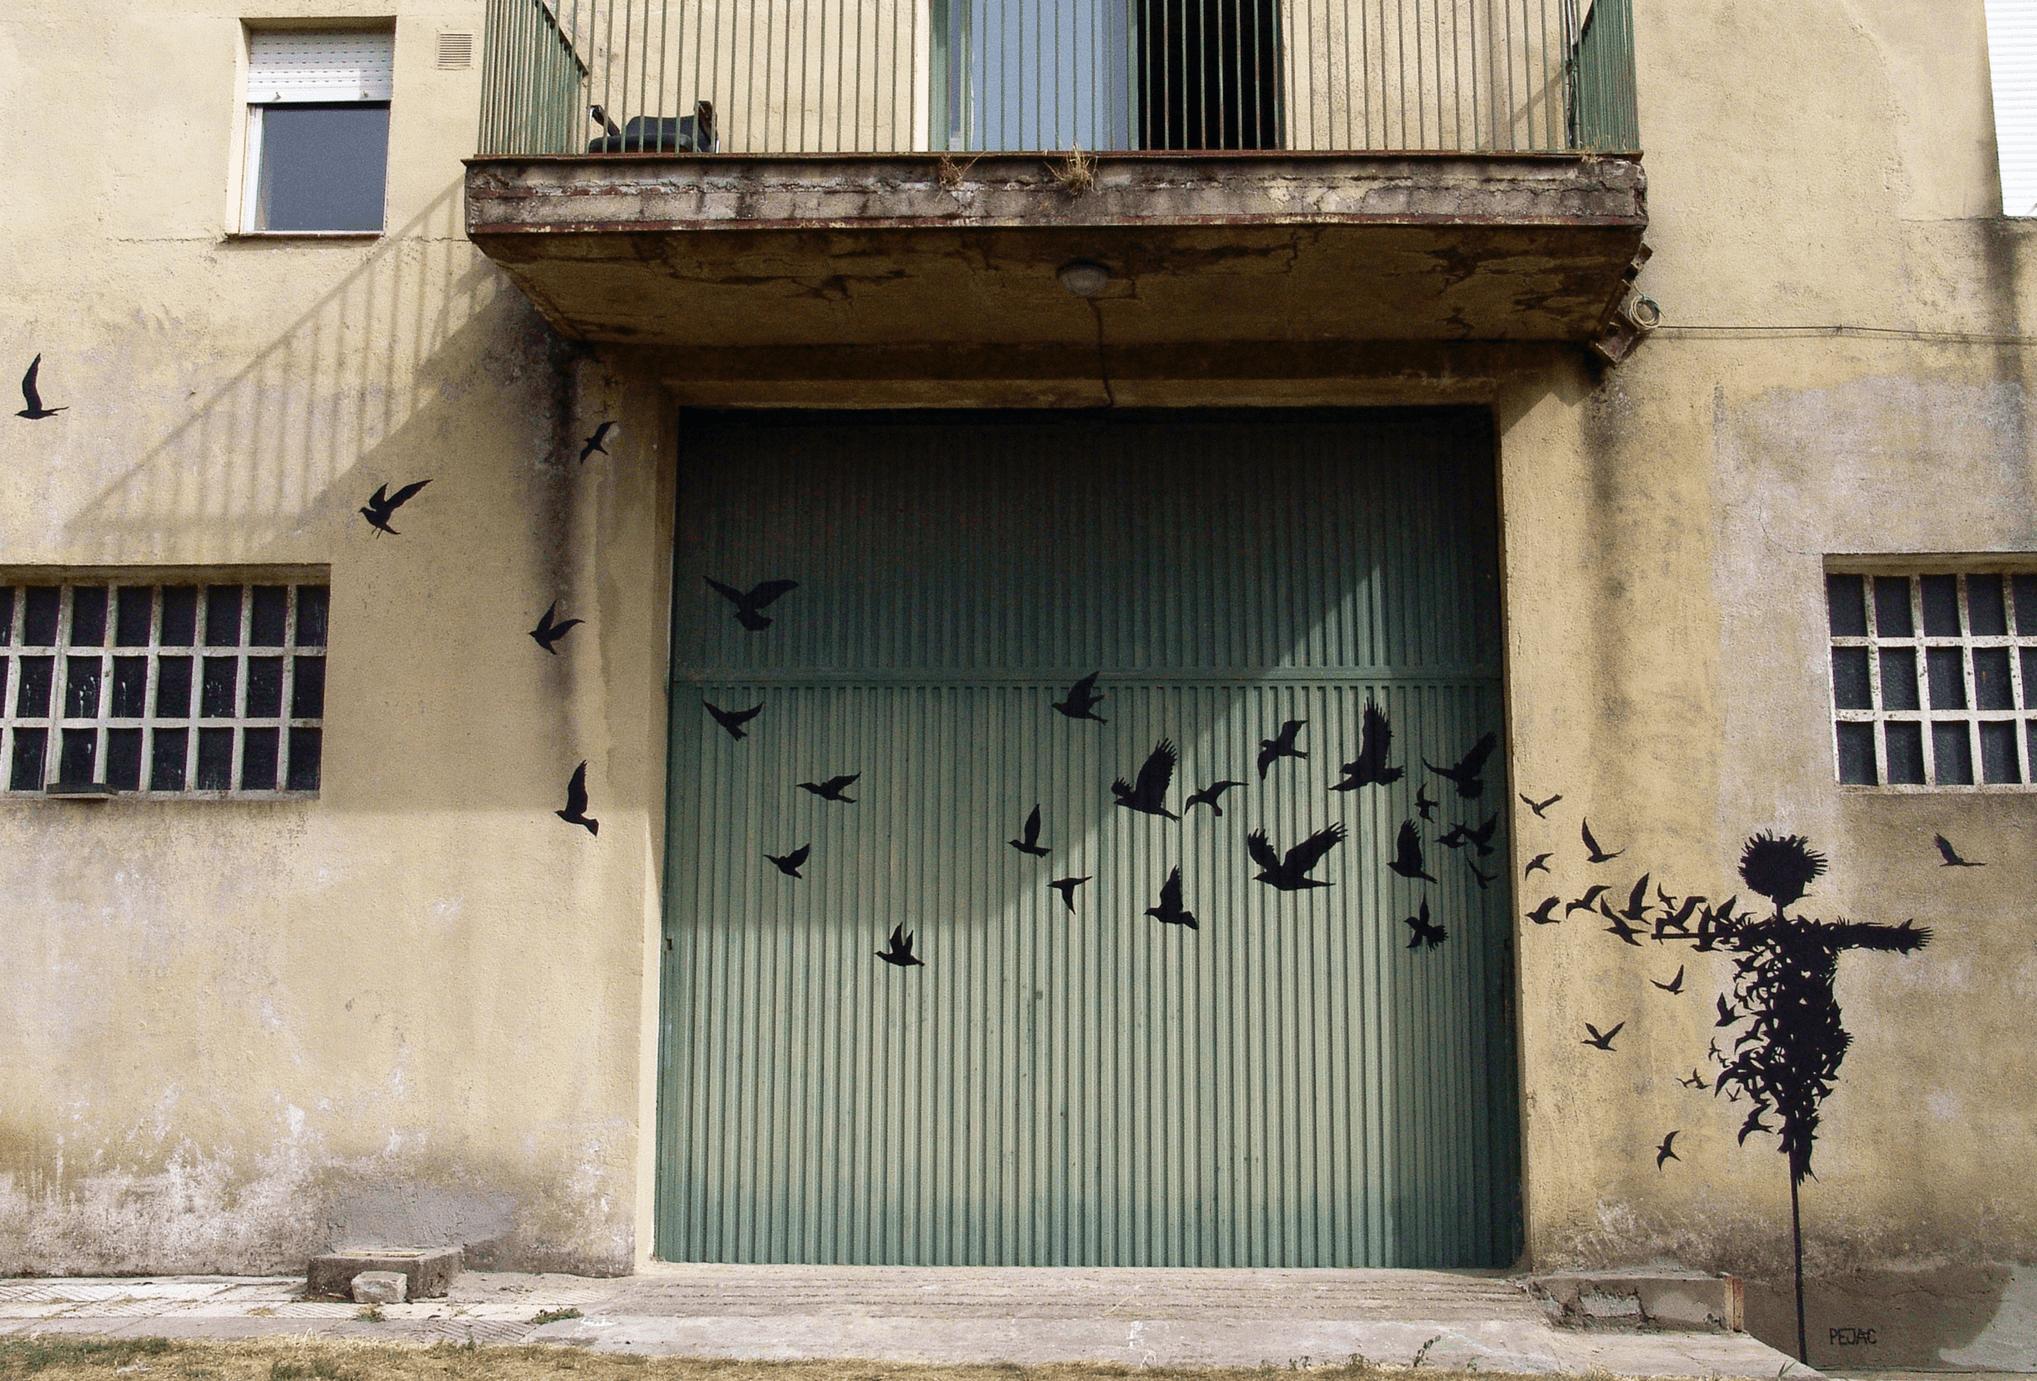 Esparcepajaros+-+Spain,+Salamanca+-+2010+